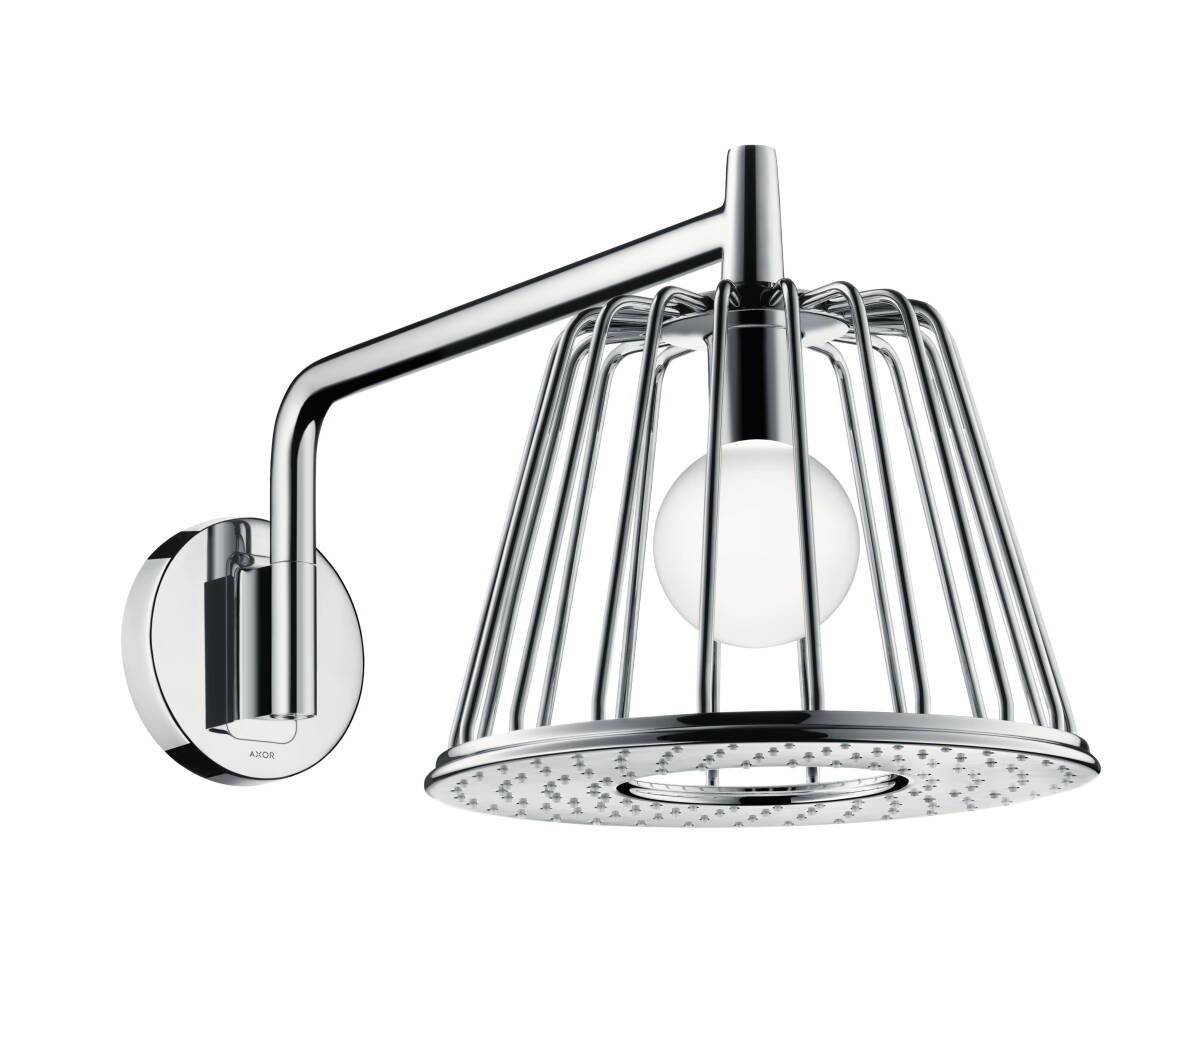 LampShower 275 1jet mit Brausearm, Chrom, 26031000